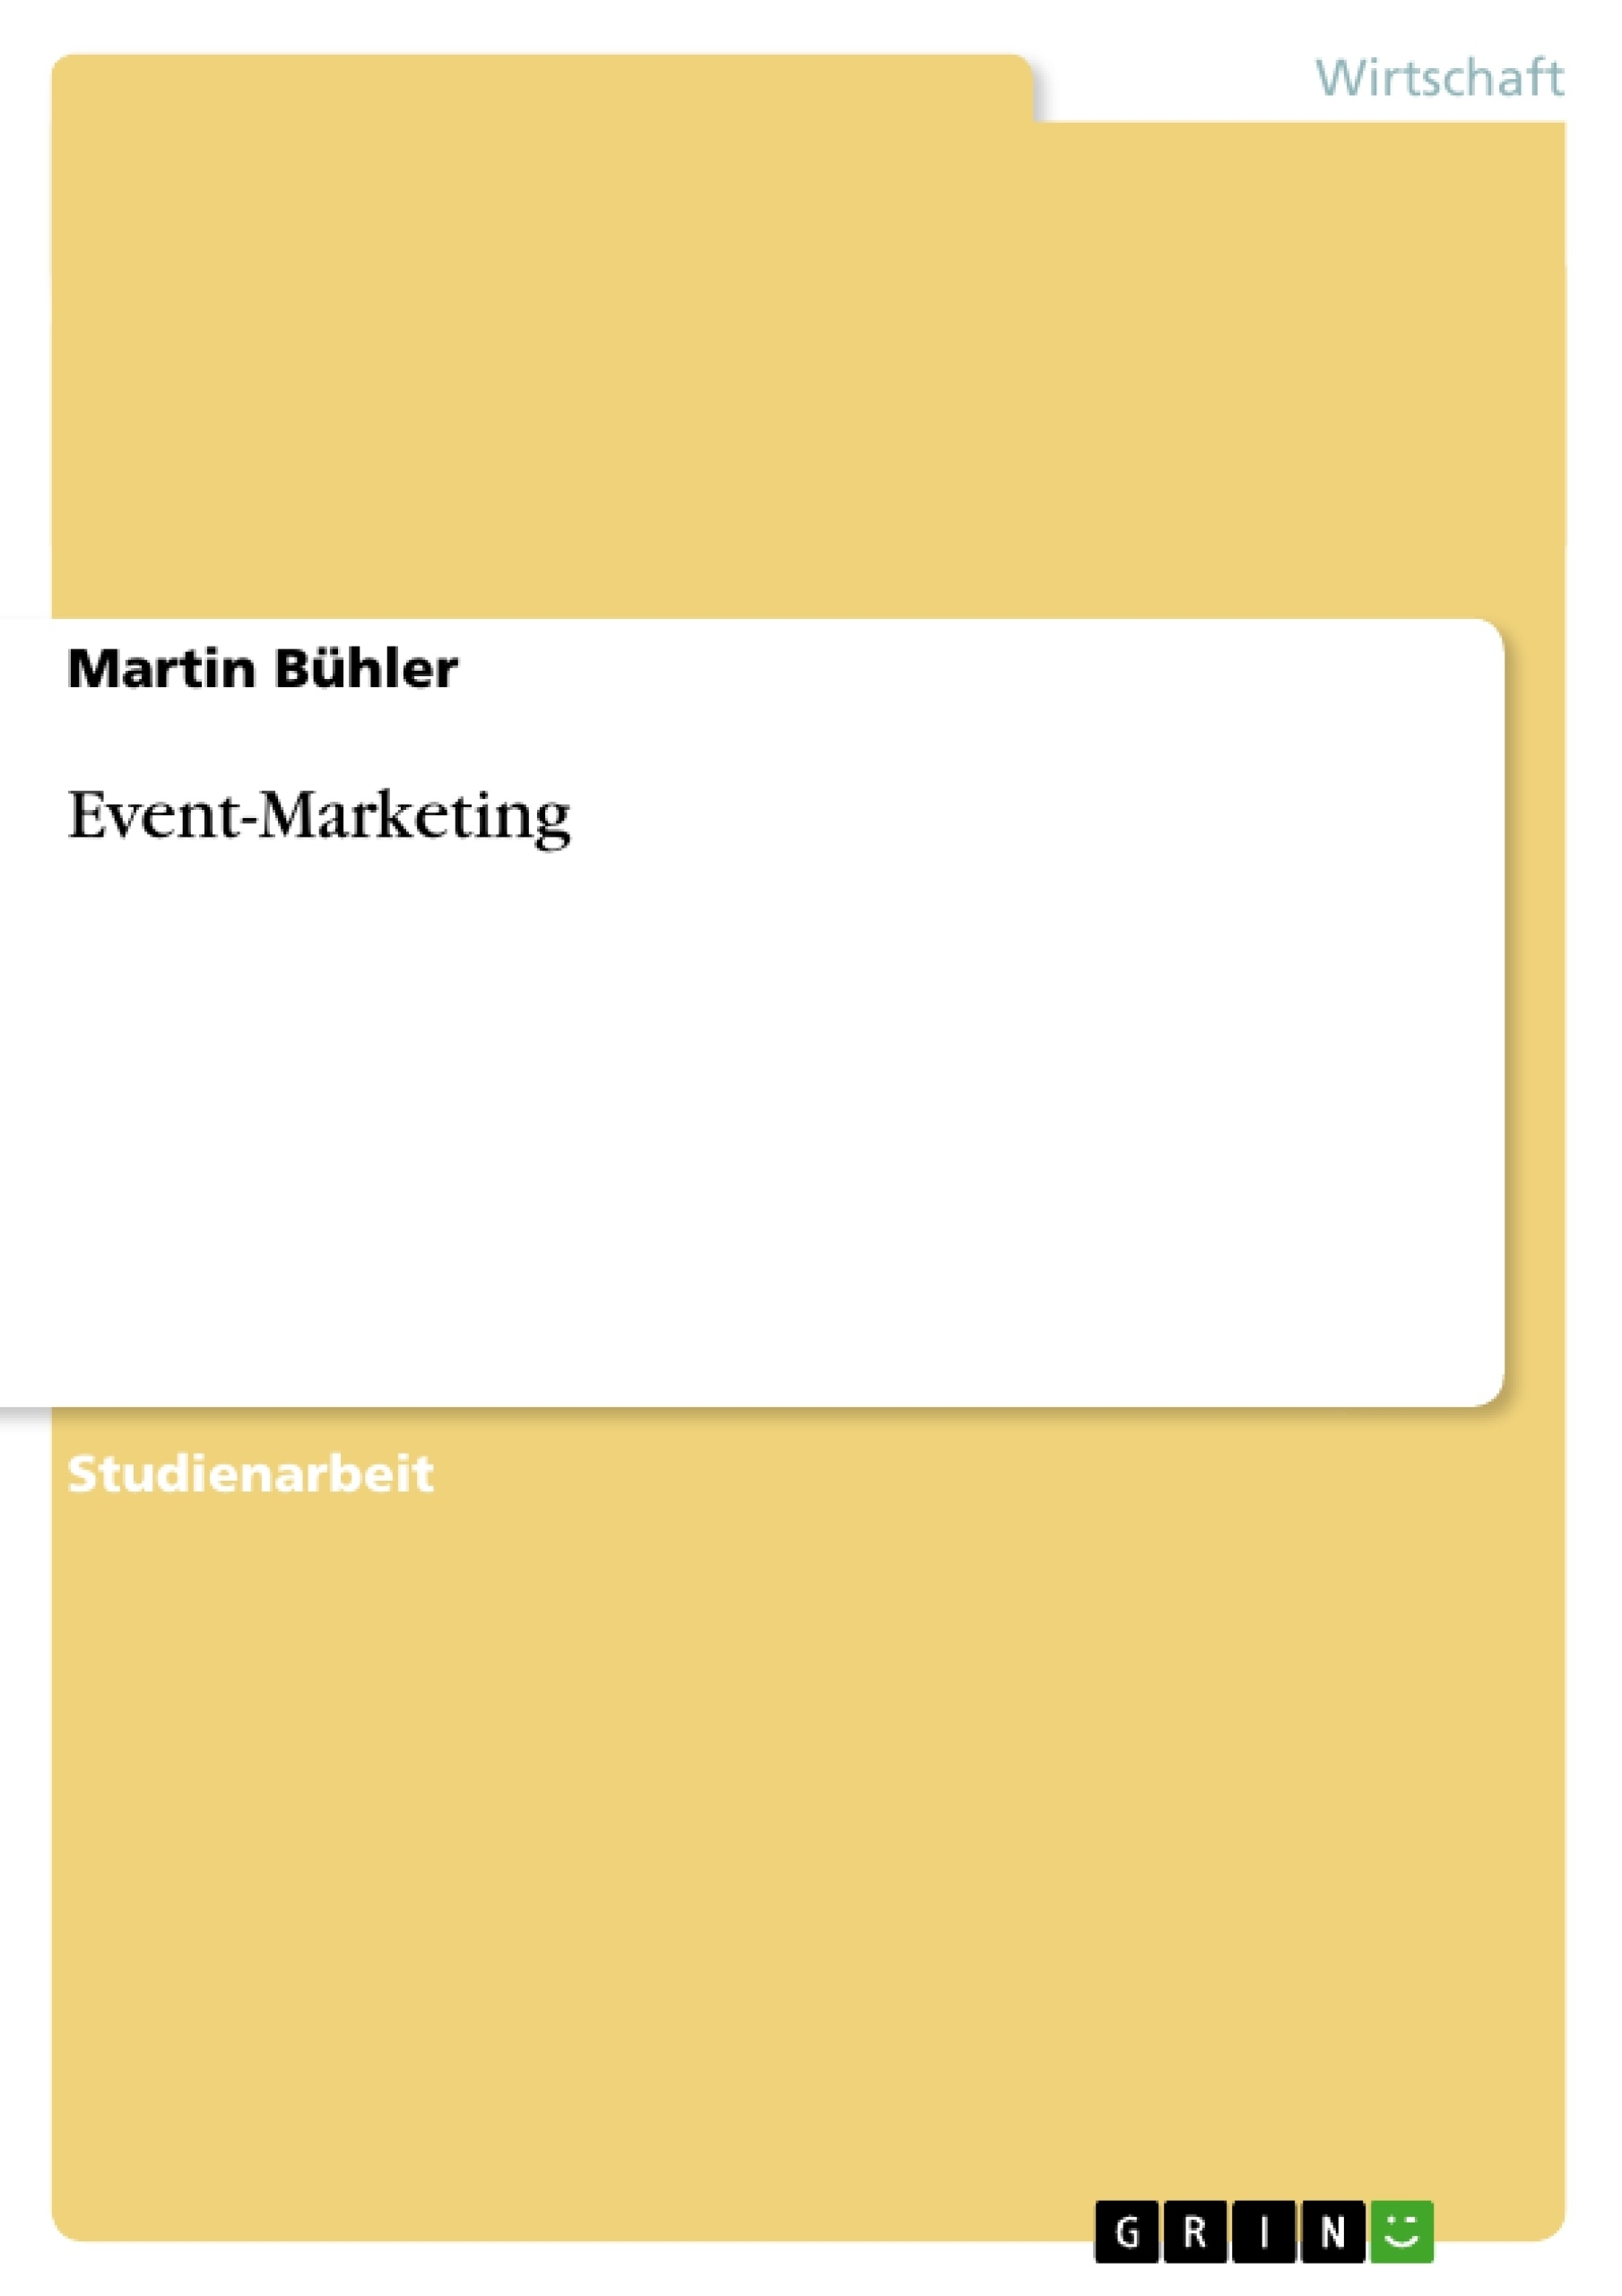 Titel: Event-Marketing